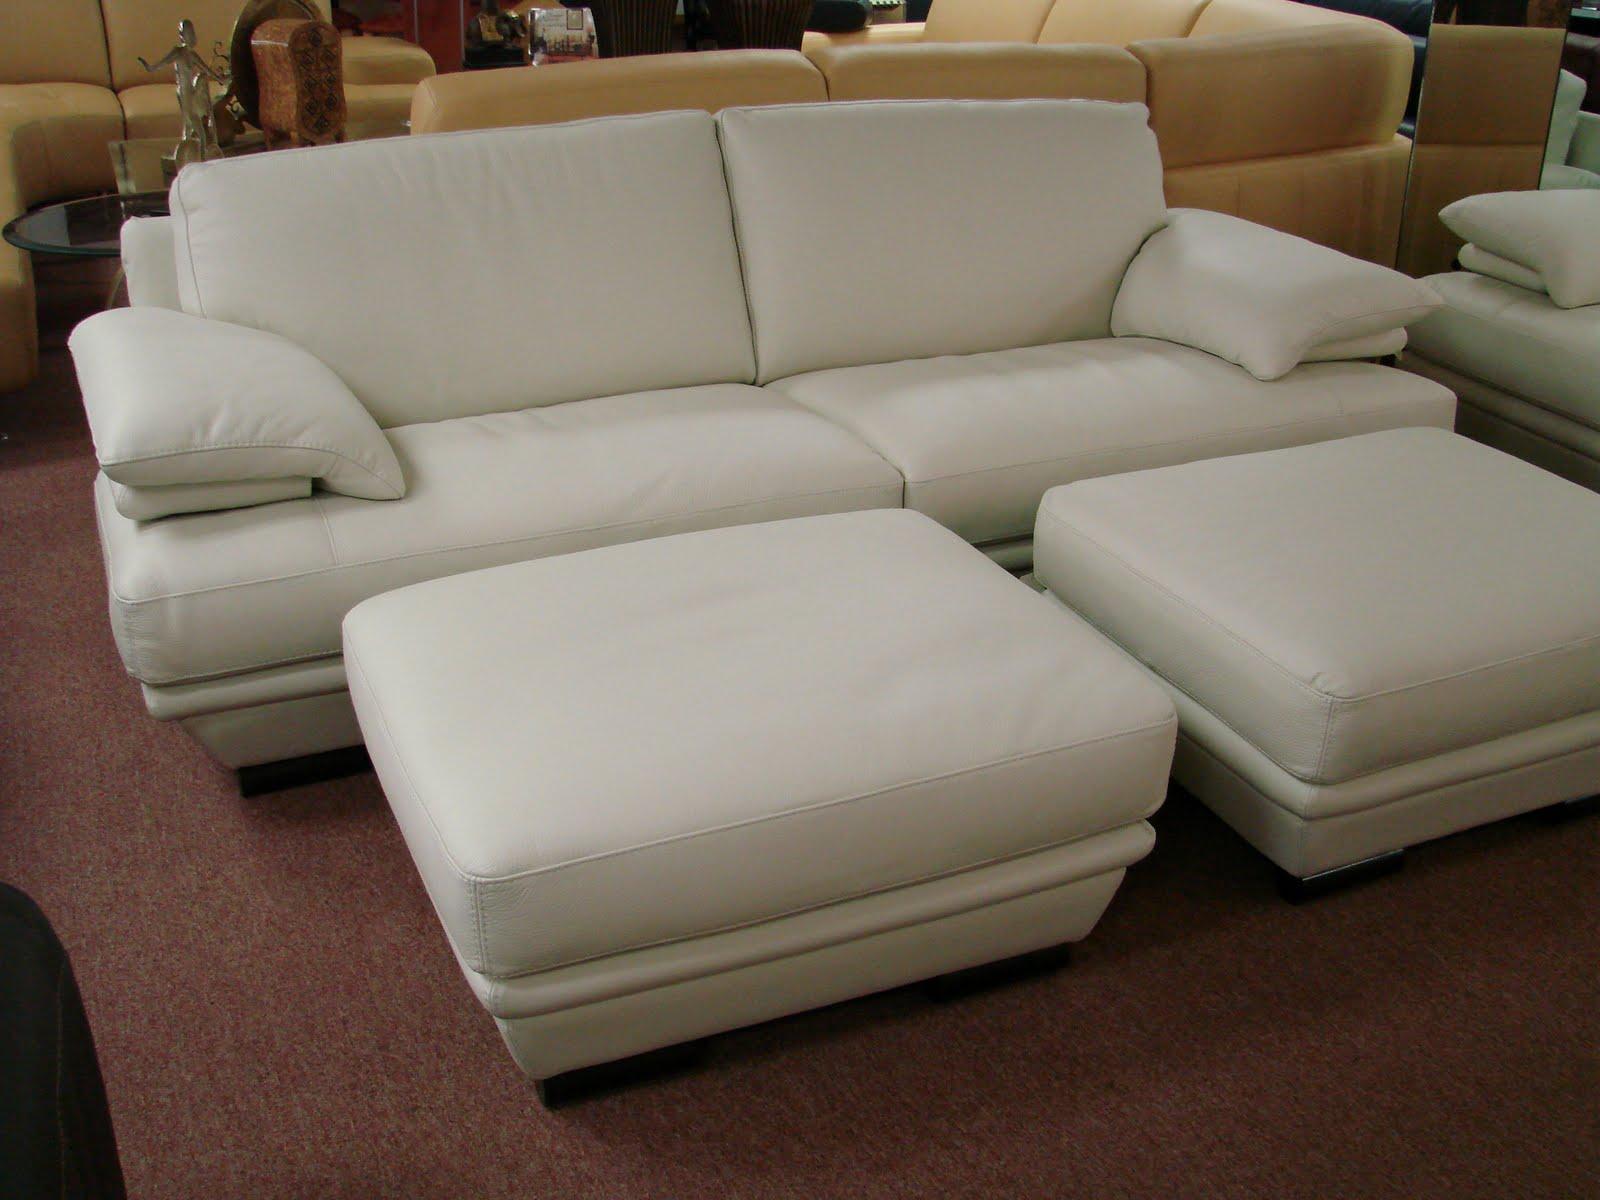 Natuzzi Furniture Prices